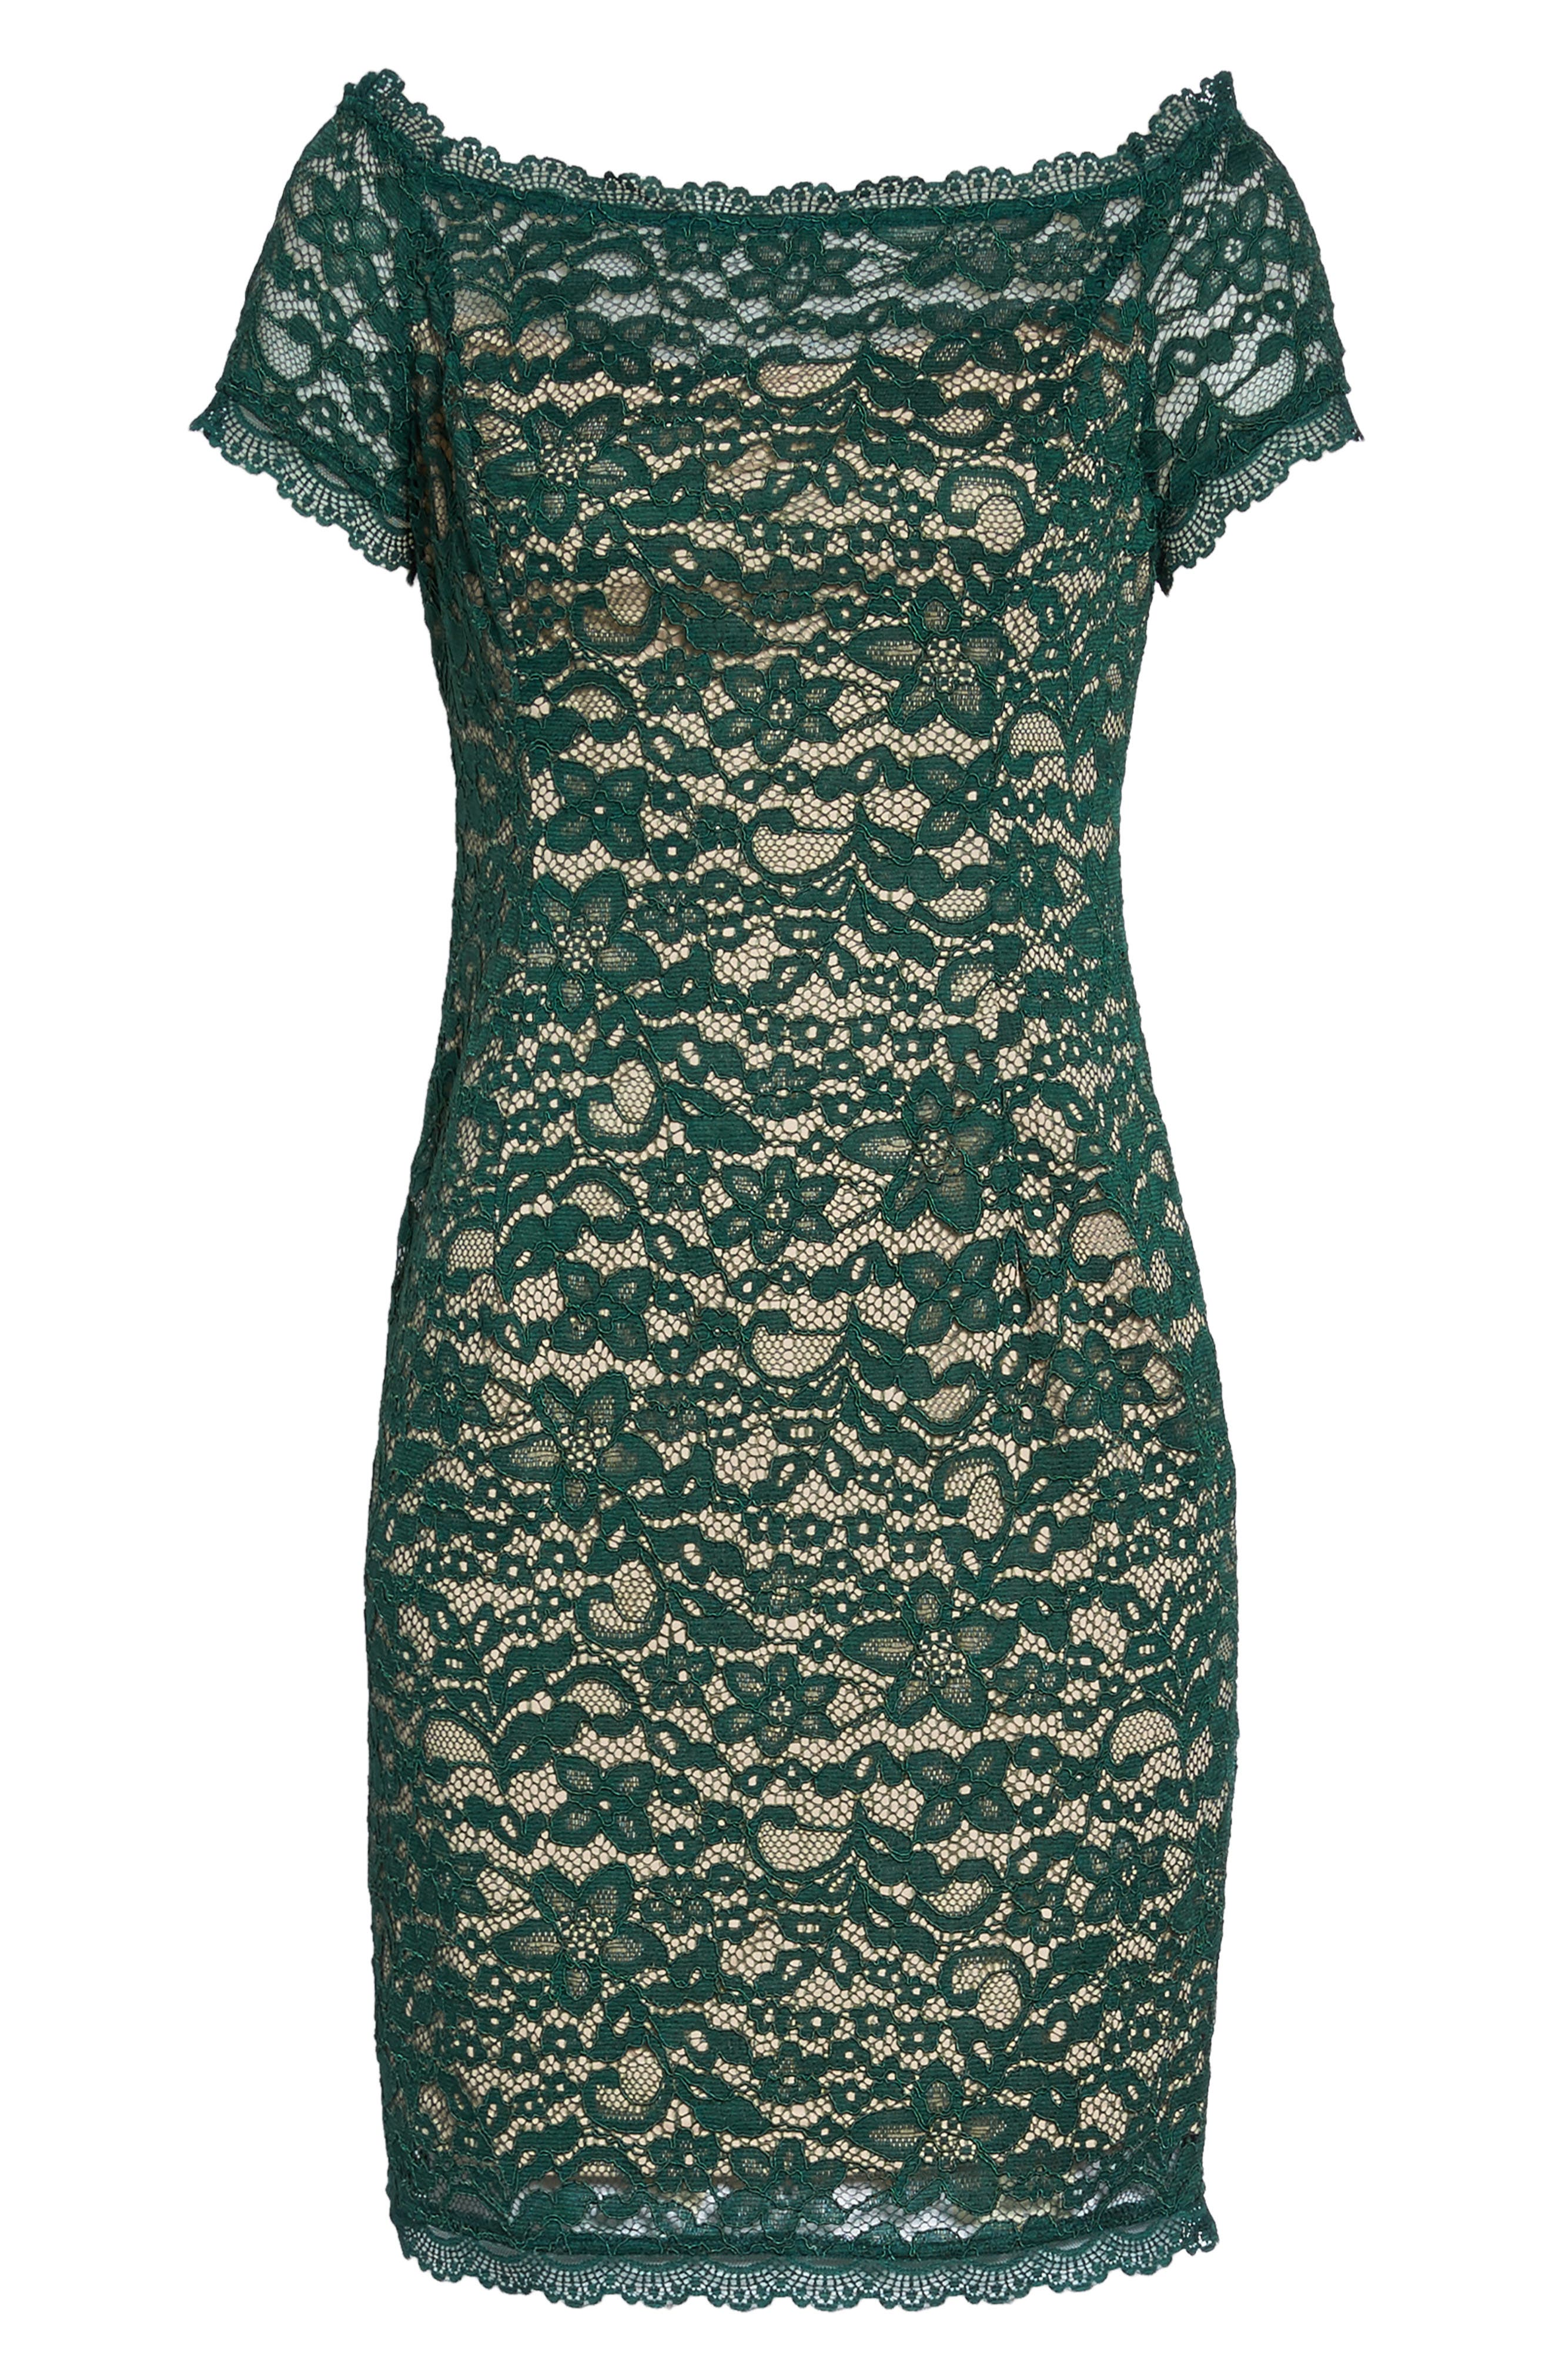 Aubrey Lace Sheath Dress,                             Alternate thumbnail 6, color,                             303